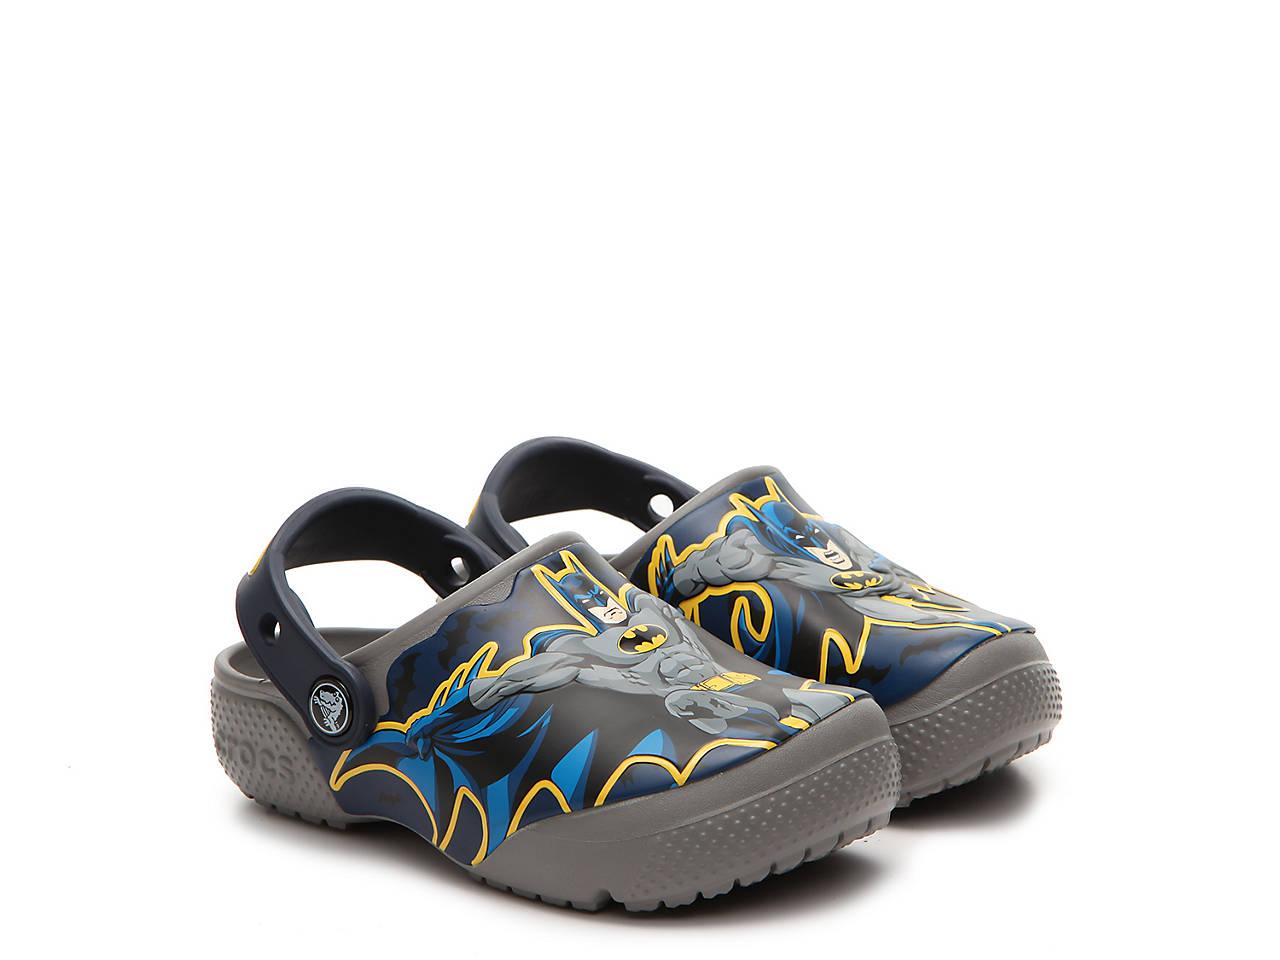 fee8f85916d9b2 Crocs FunLab Batman Boys Toddler Clog Kids Shoes